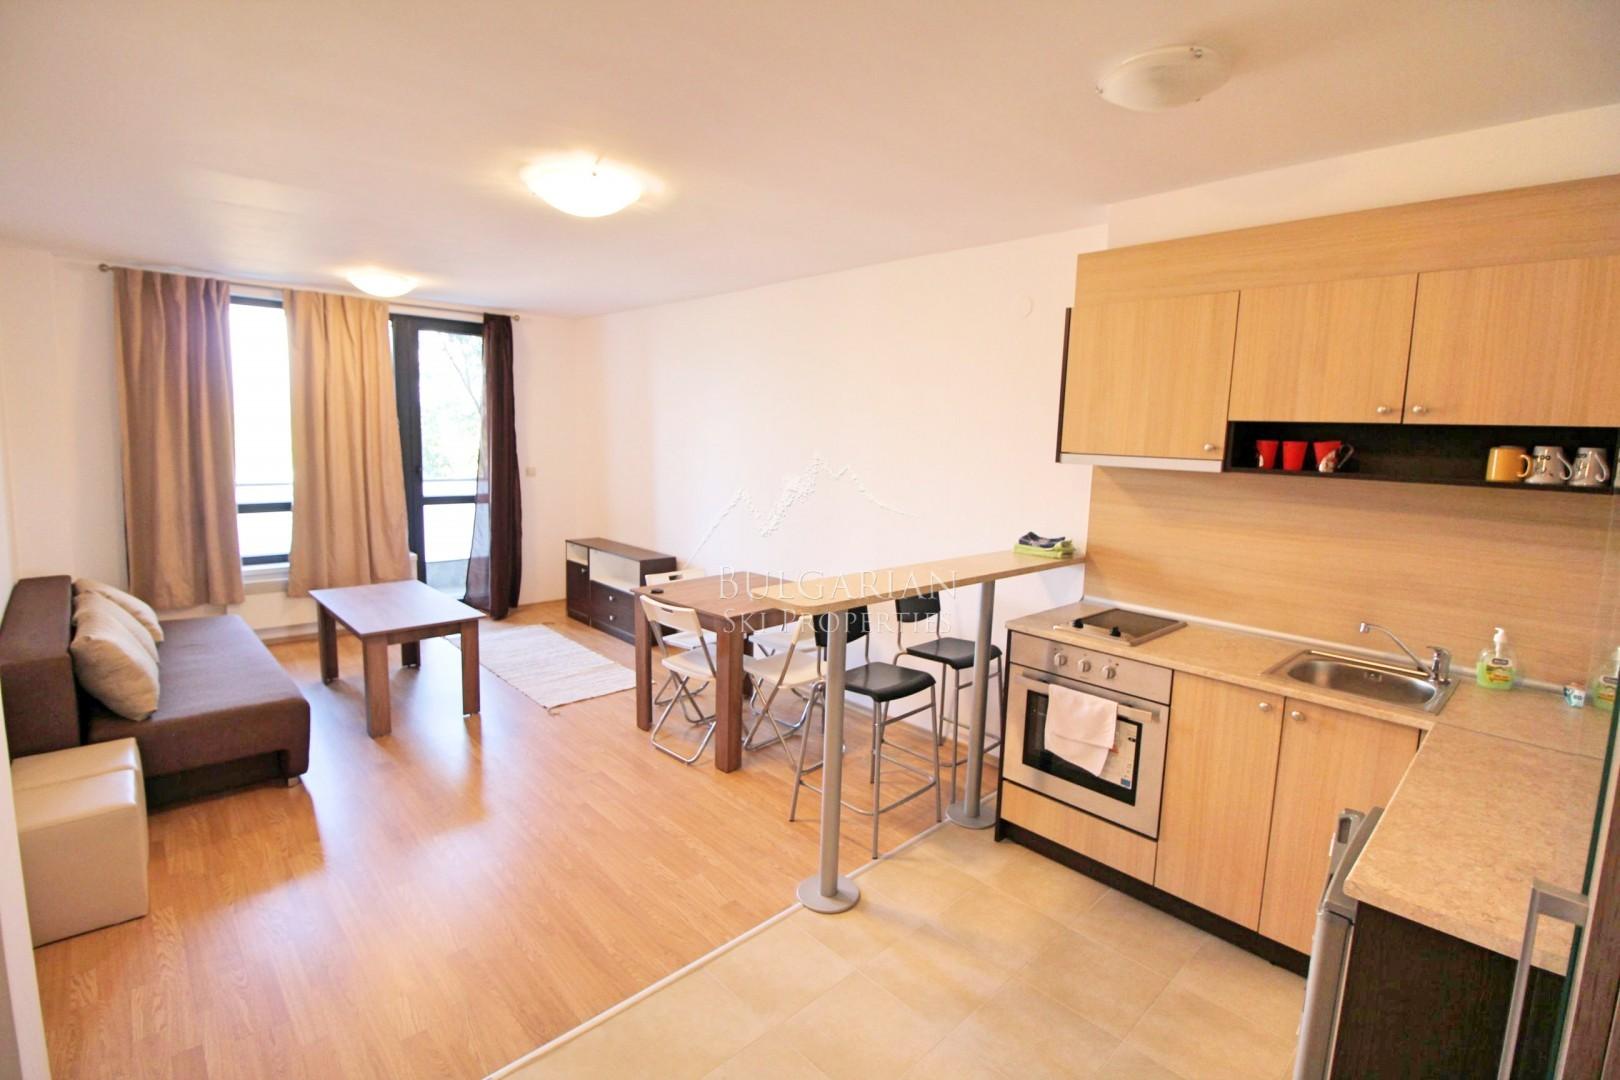 Аспен Хайтс, Банско: Обзаведен двустаен апартамент за продажба